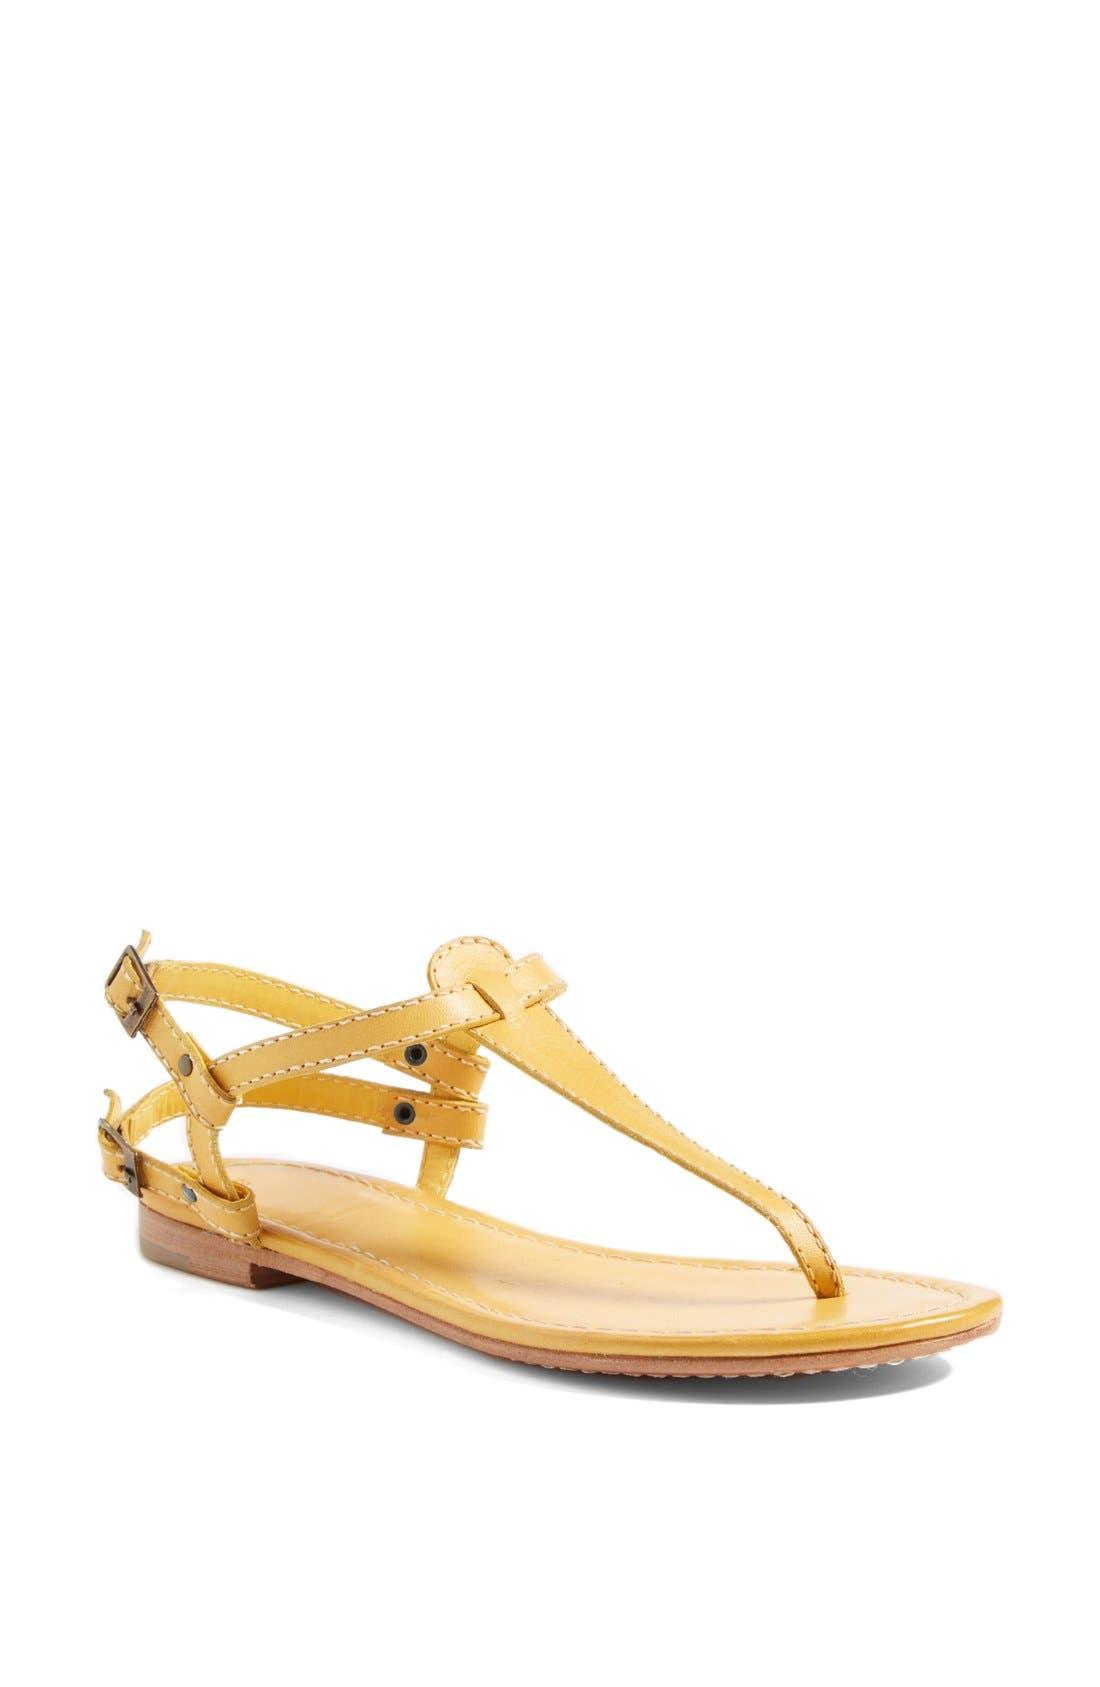 Main Image - Hinge 'Sunshine' Flat Sandal